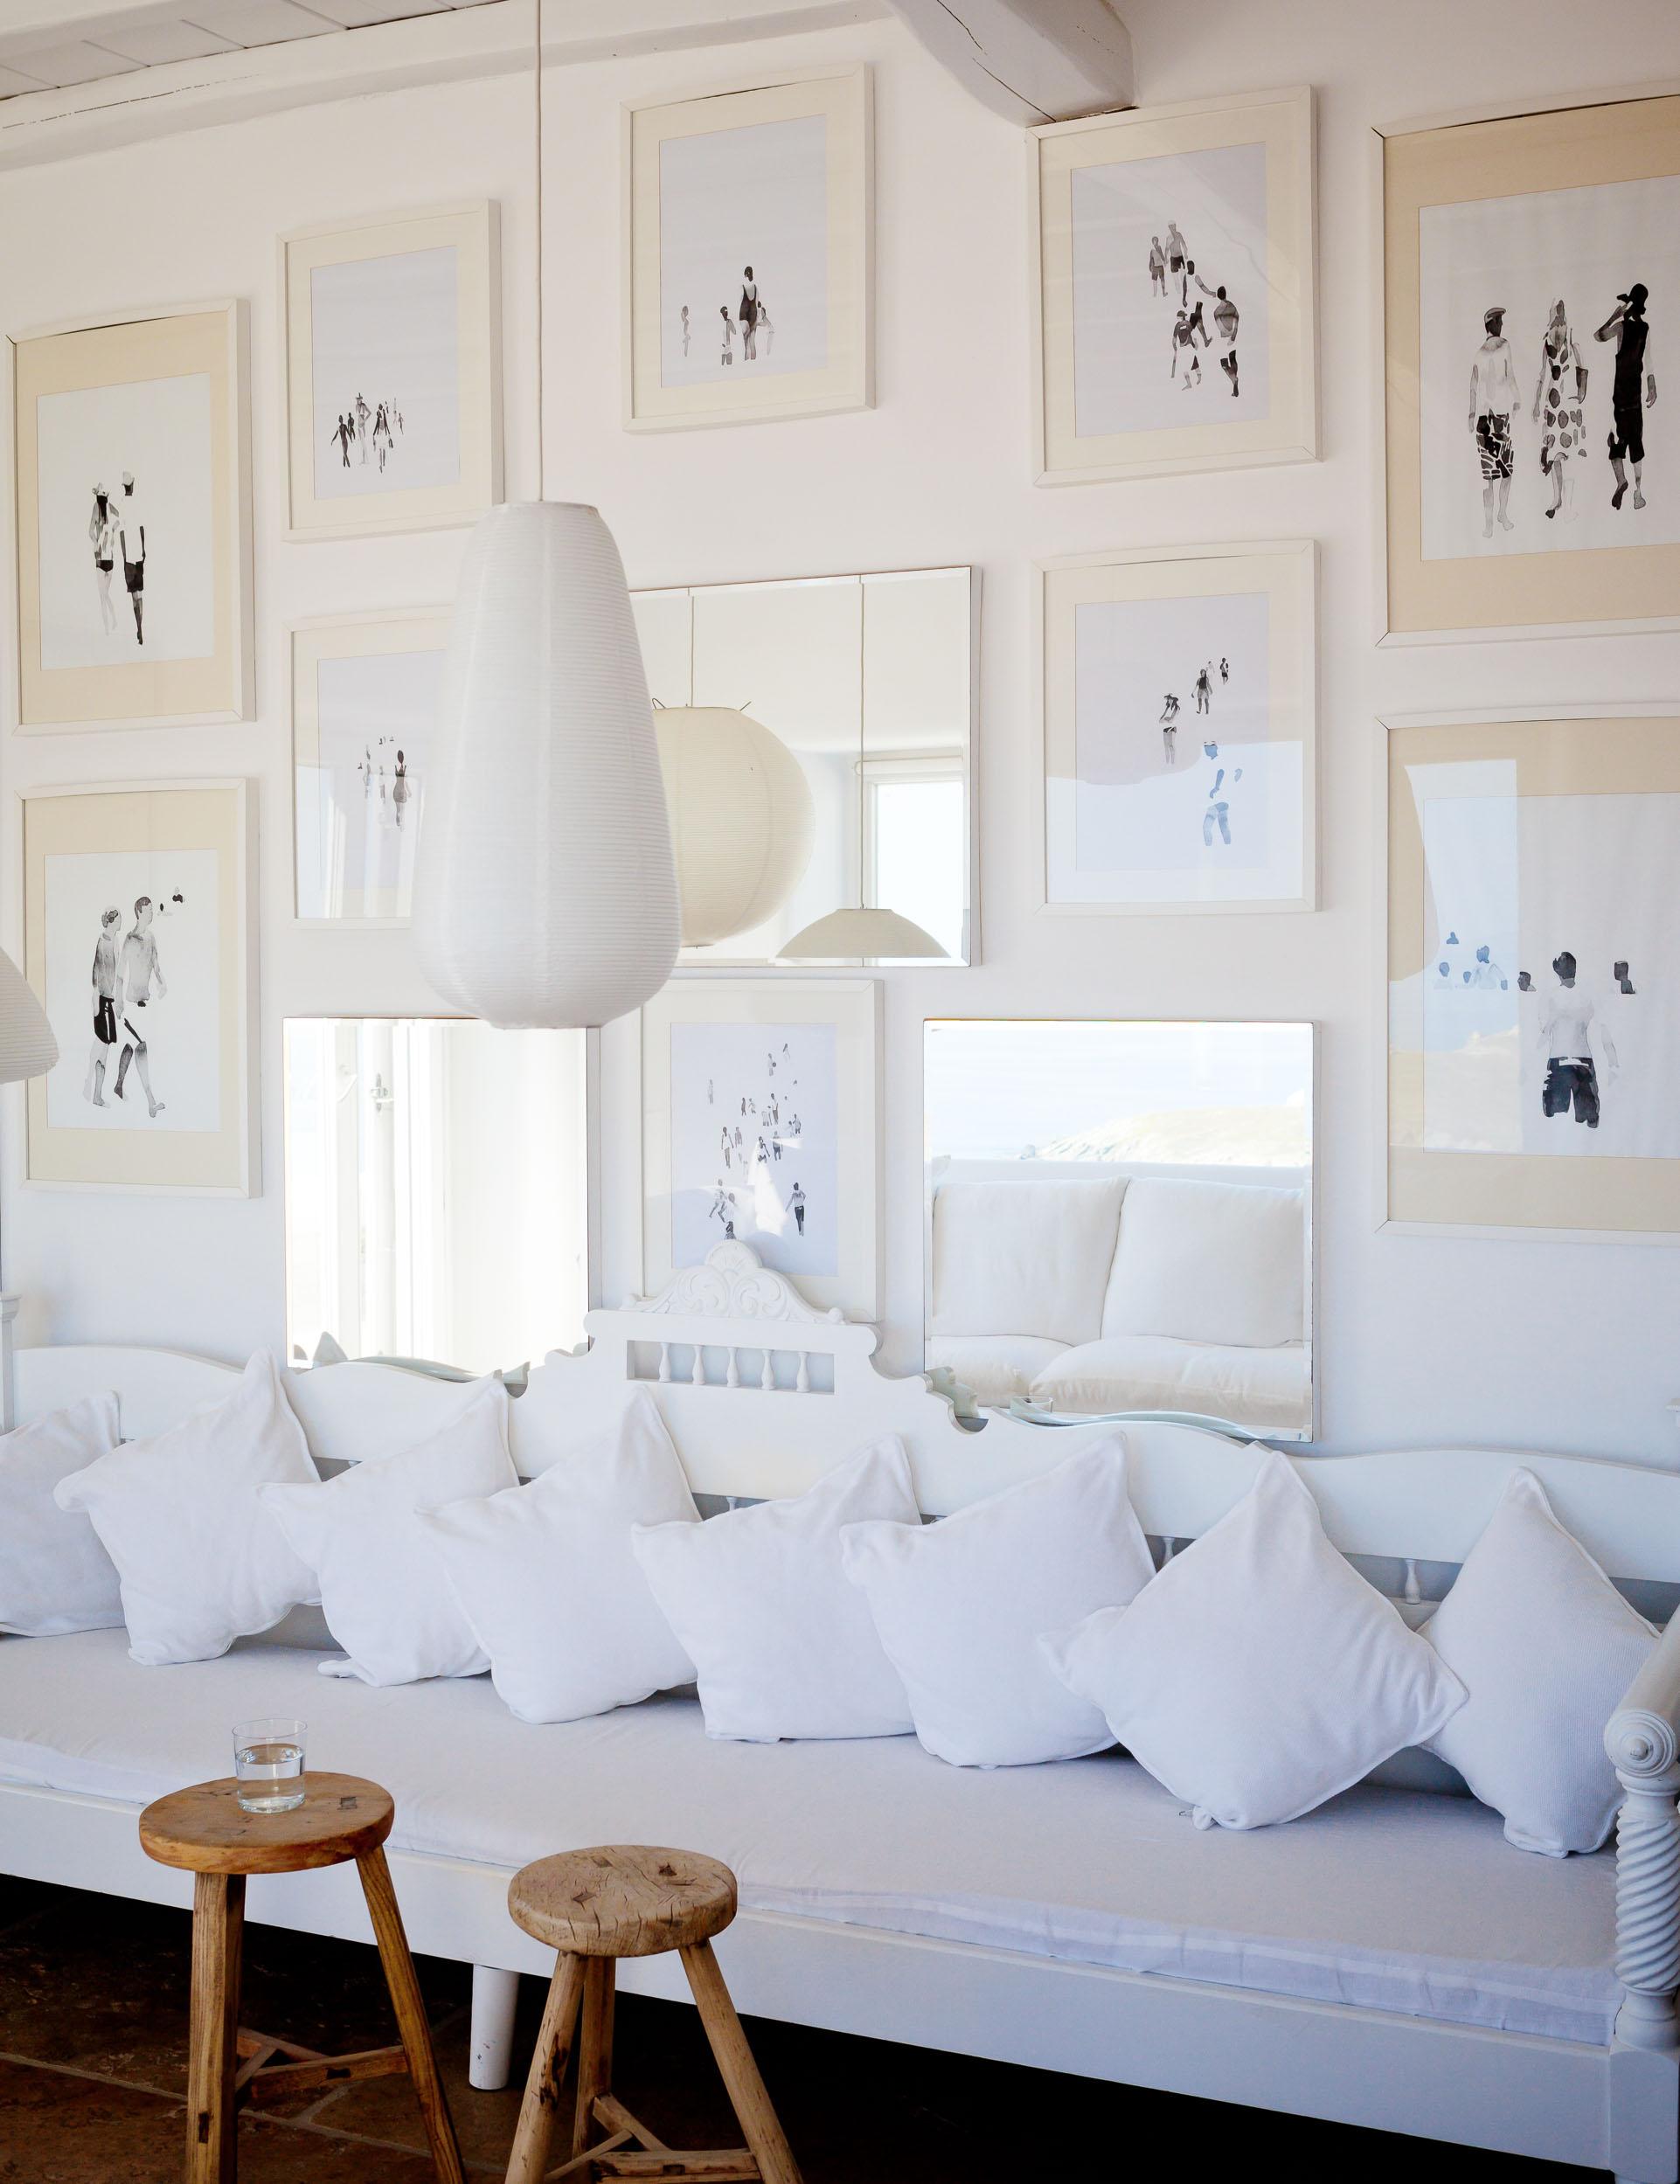 jerome-galland-interiors-LNB-008-30042011.jpg